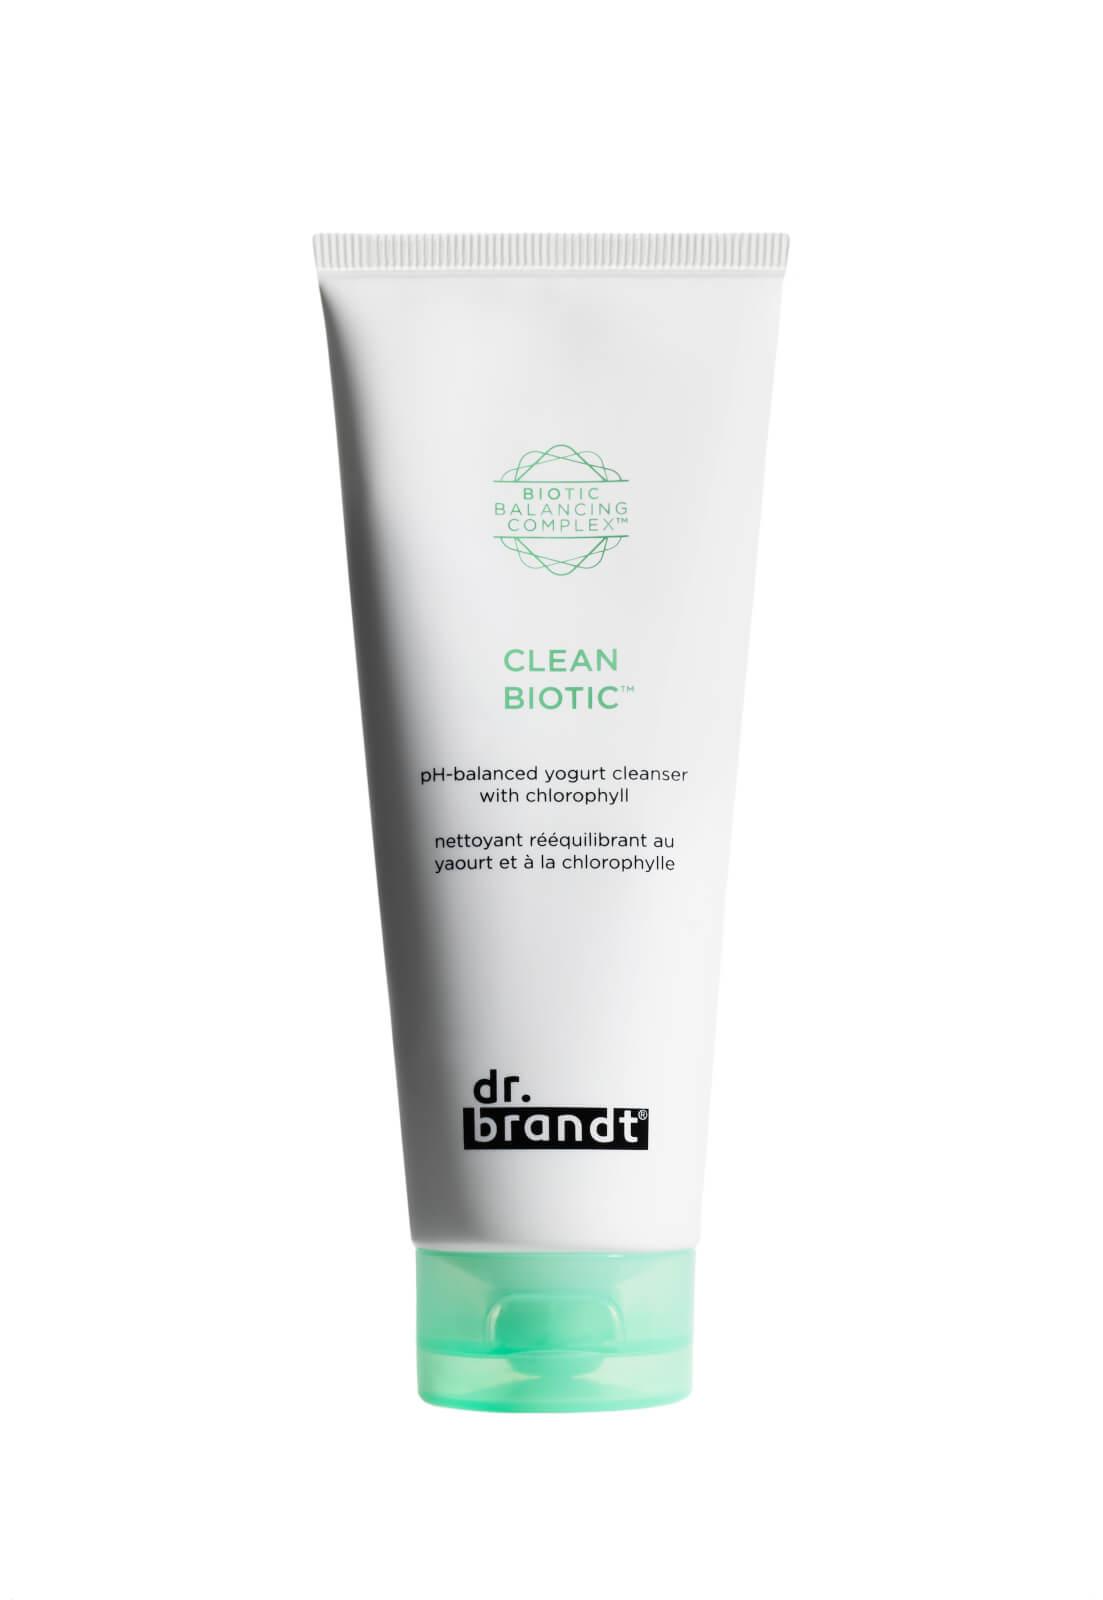 Dr. Brandt Clean Biotic pH Balanced Yogurt Cleanser with Chlorophyll 100ml